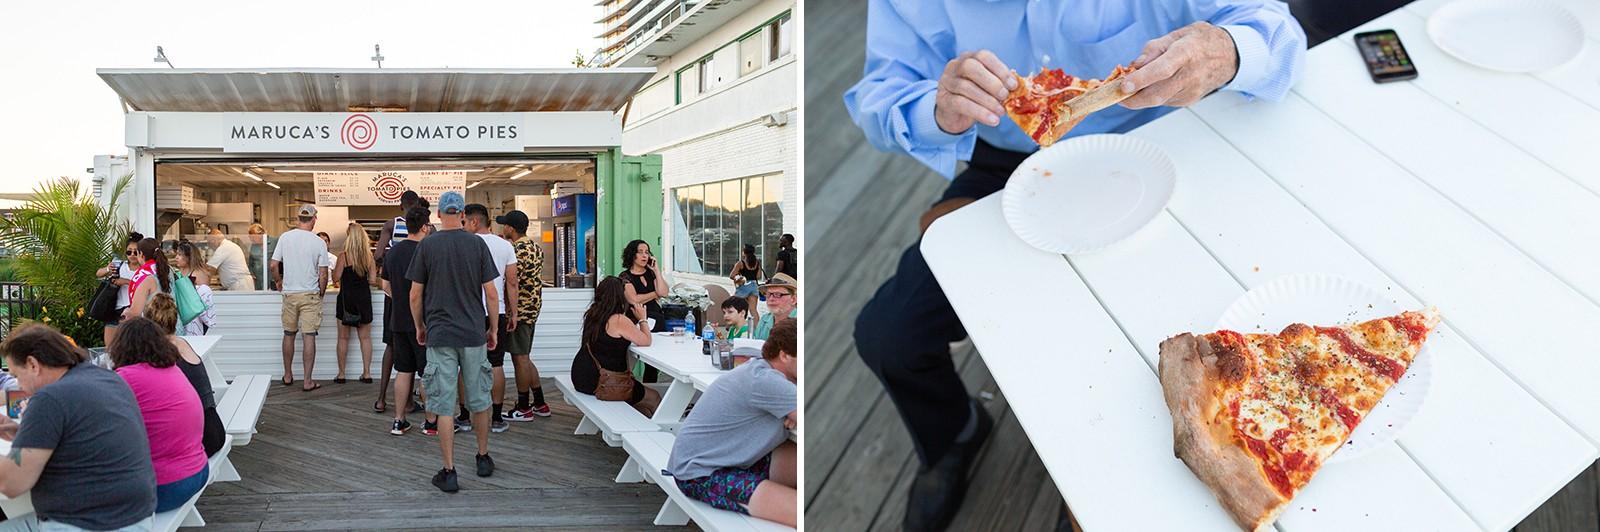 asbury park boardwalk pizza